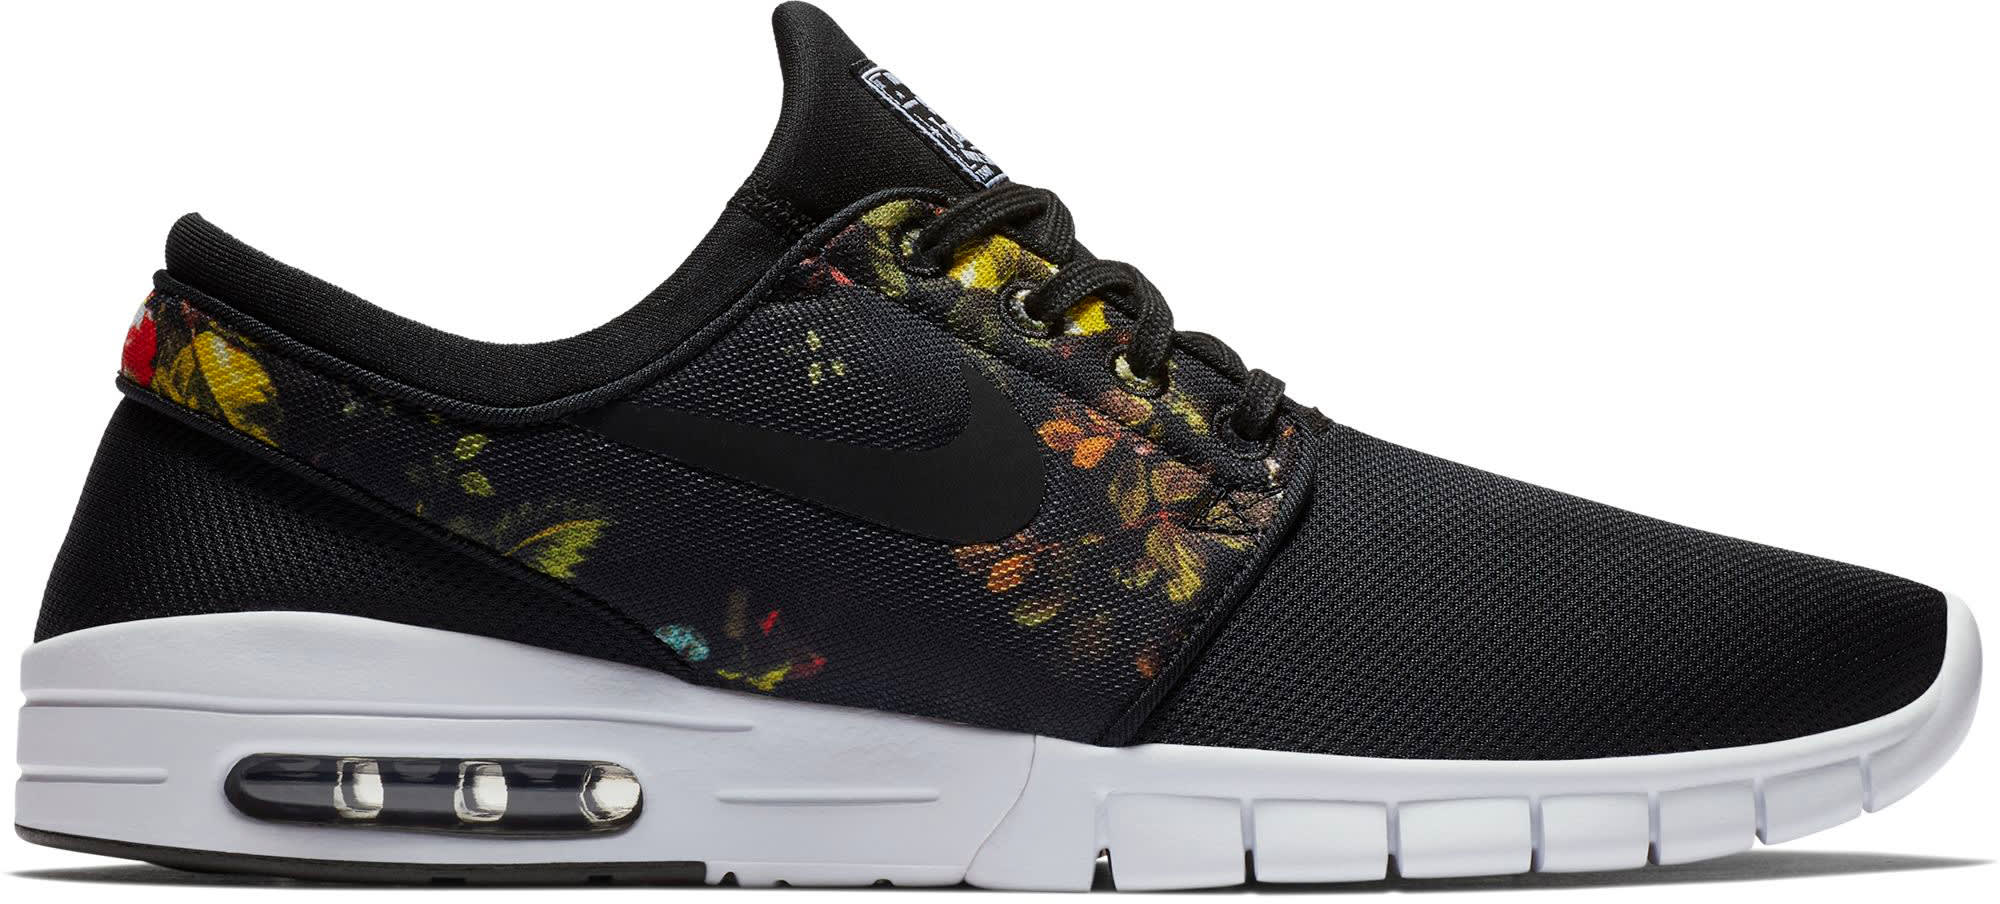 Nike SB Stefan Janoski Max Skate Shoes - thumbnail 1 3c35575dfbe0